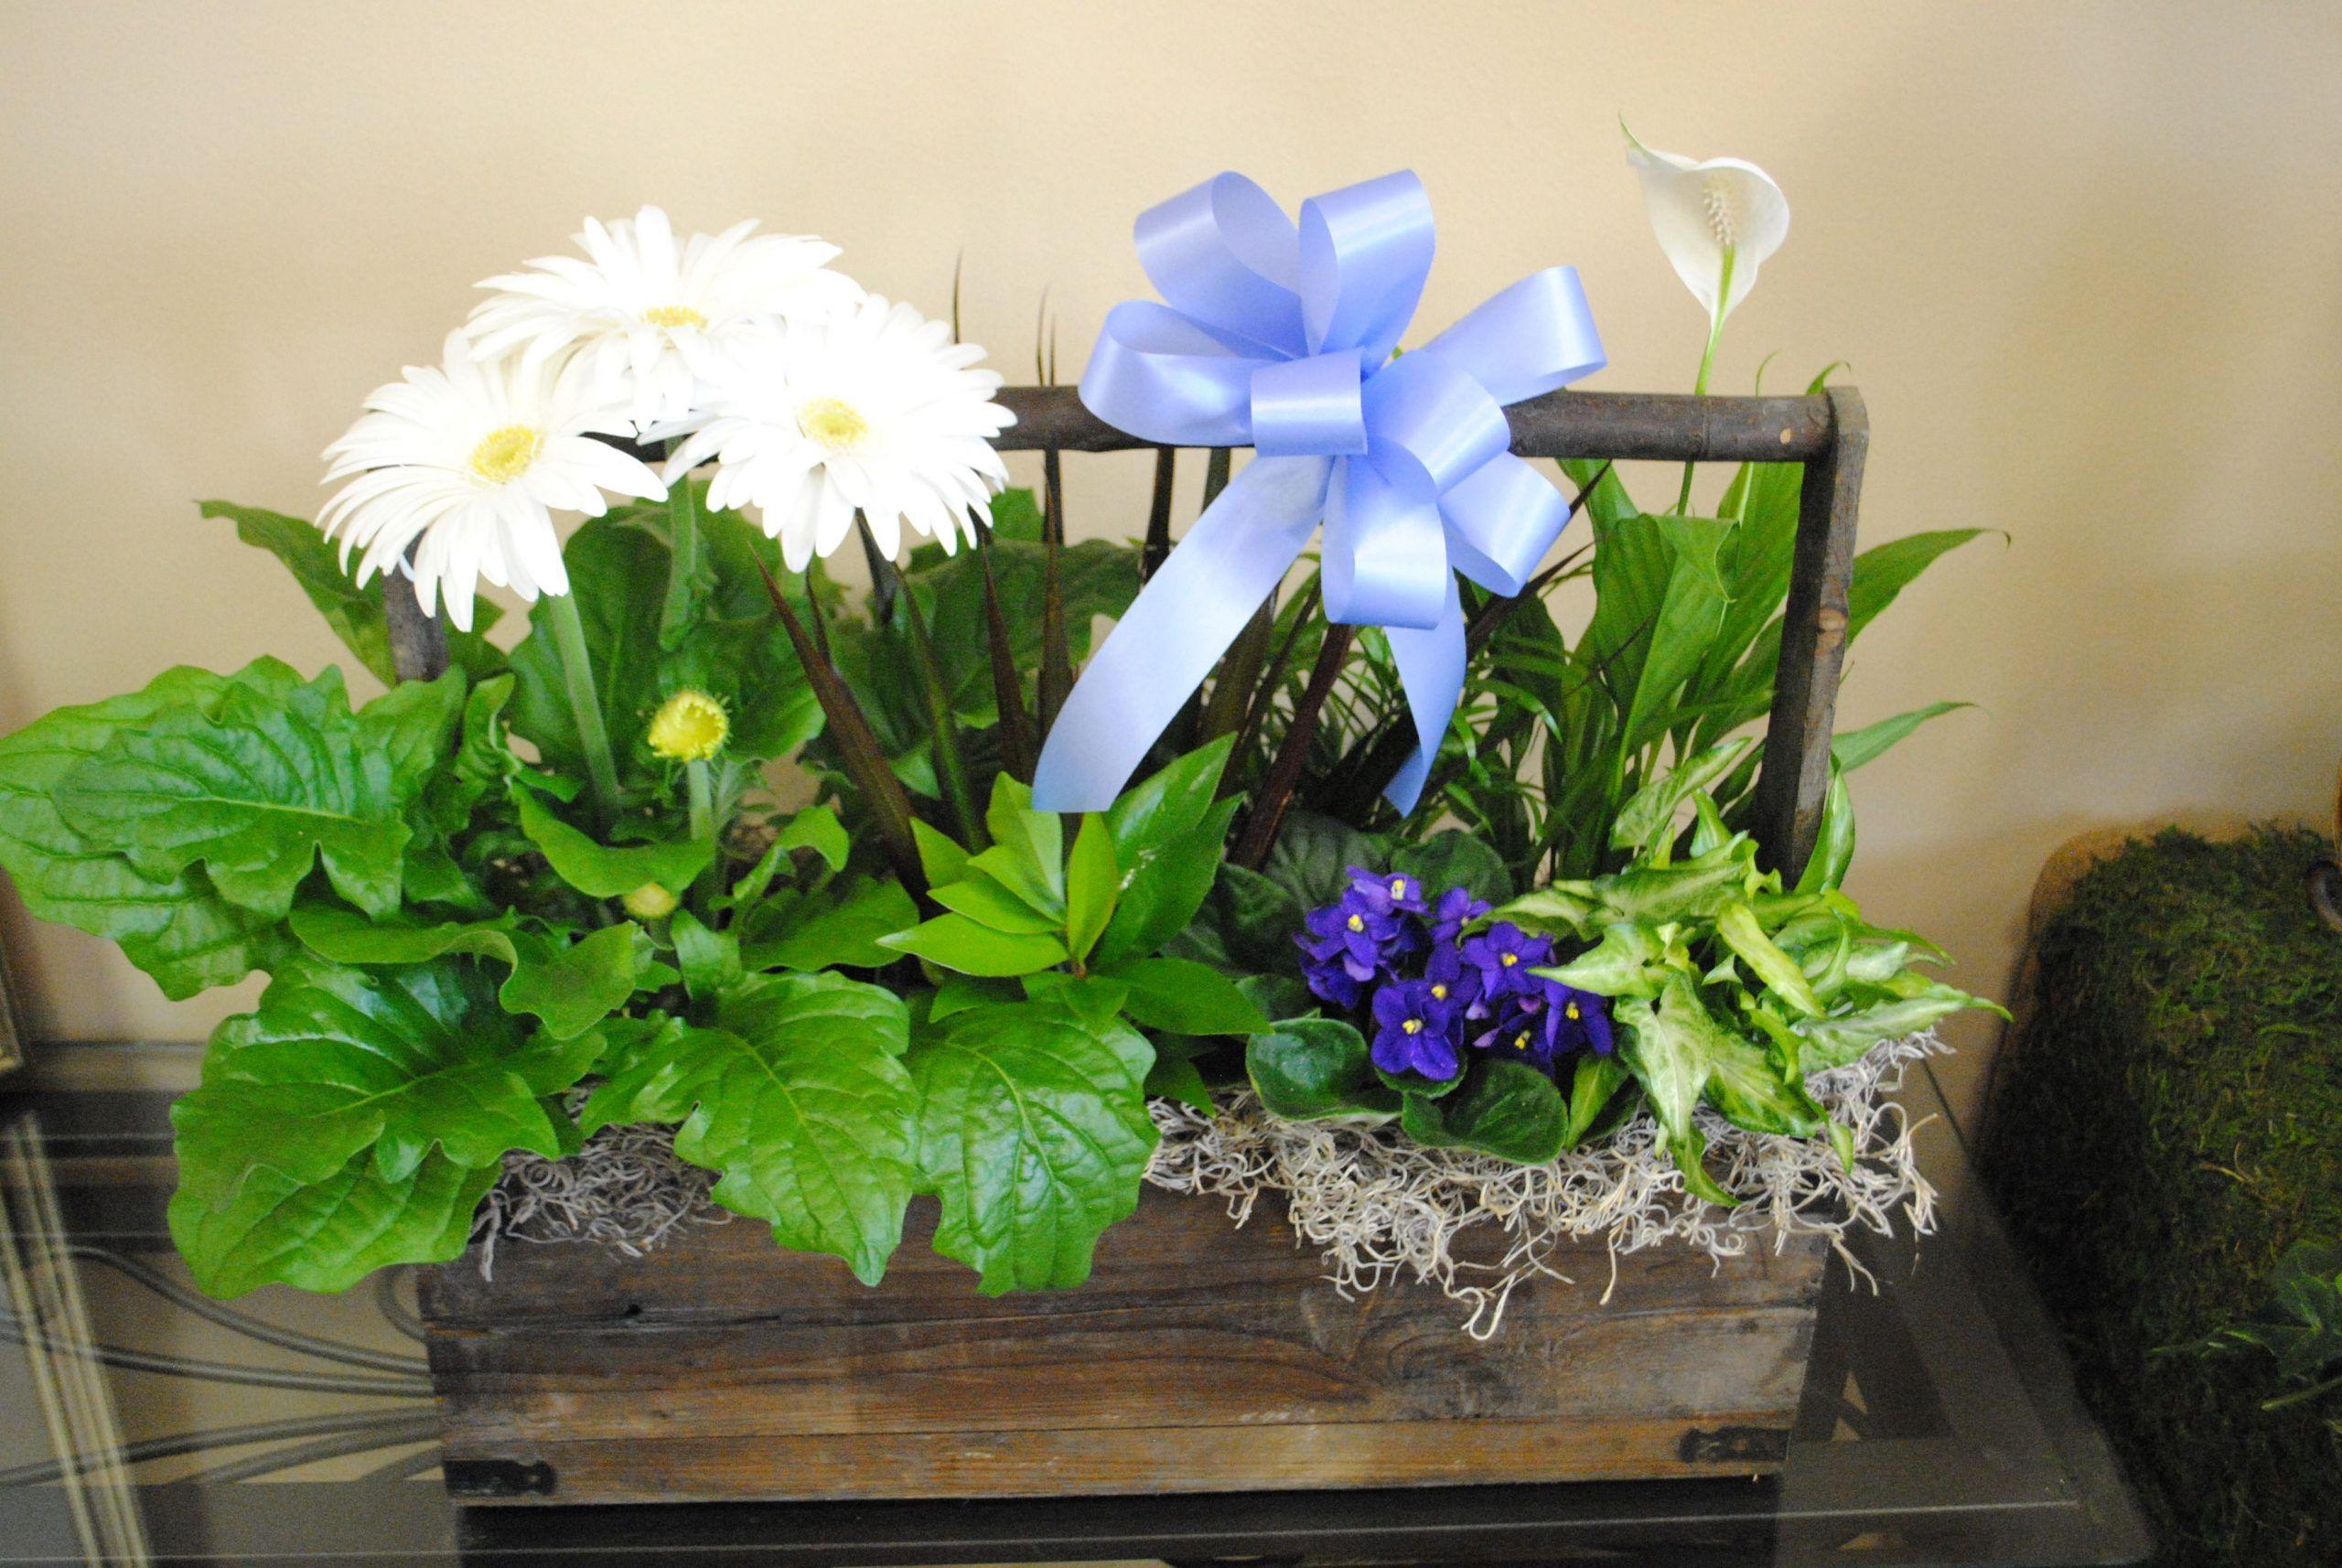 This arrangement includes a gerbera daisy plant, a peace